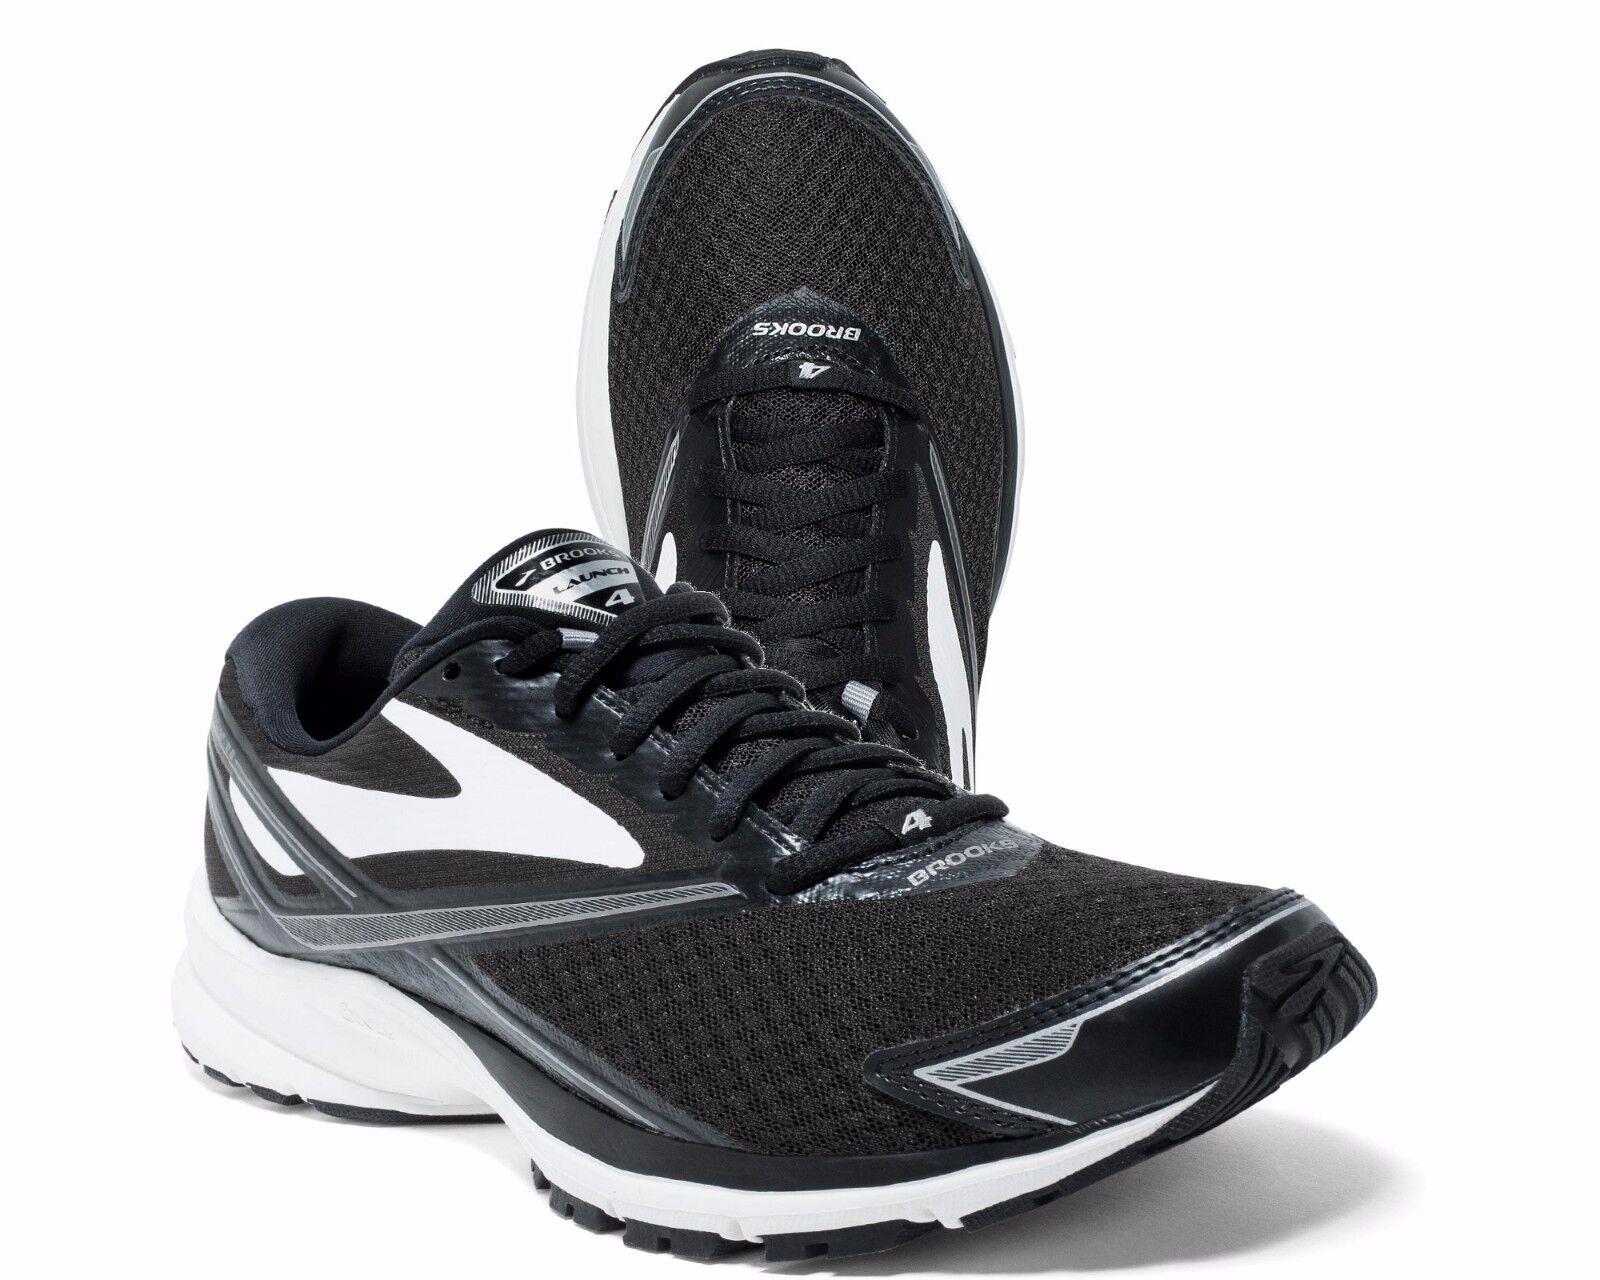 Brooks Launch (B) 4 Damenschuhe Running Schuhes (B) Launch (014) + Free AUS Delivery c30c39